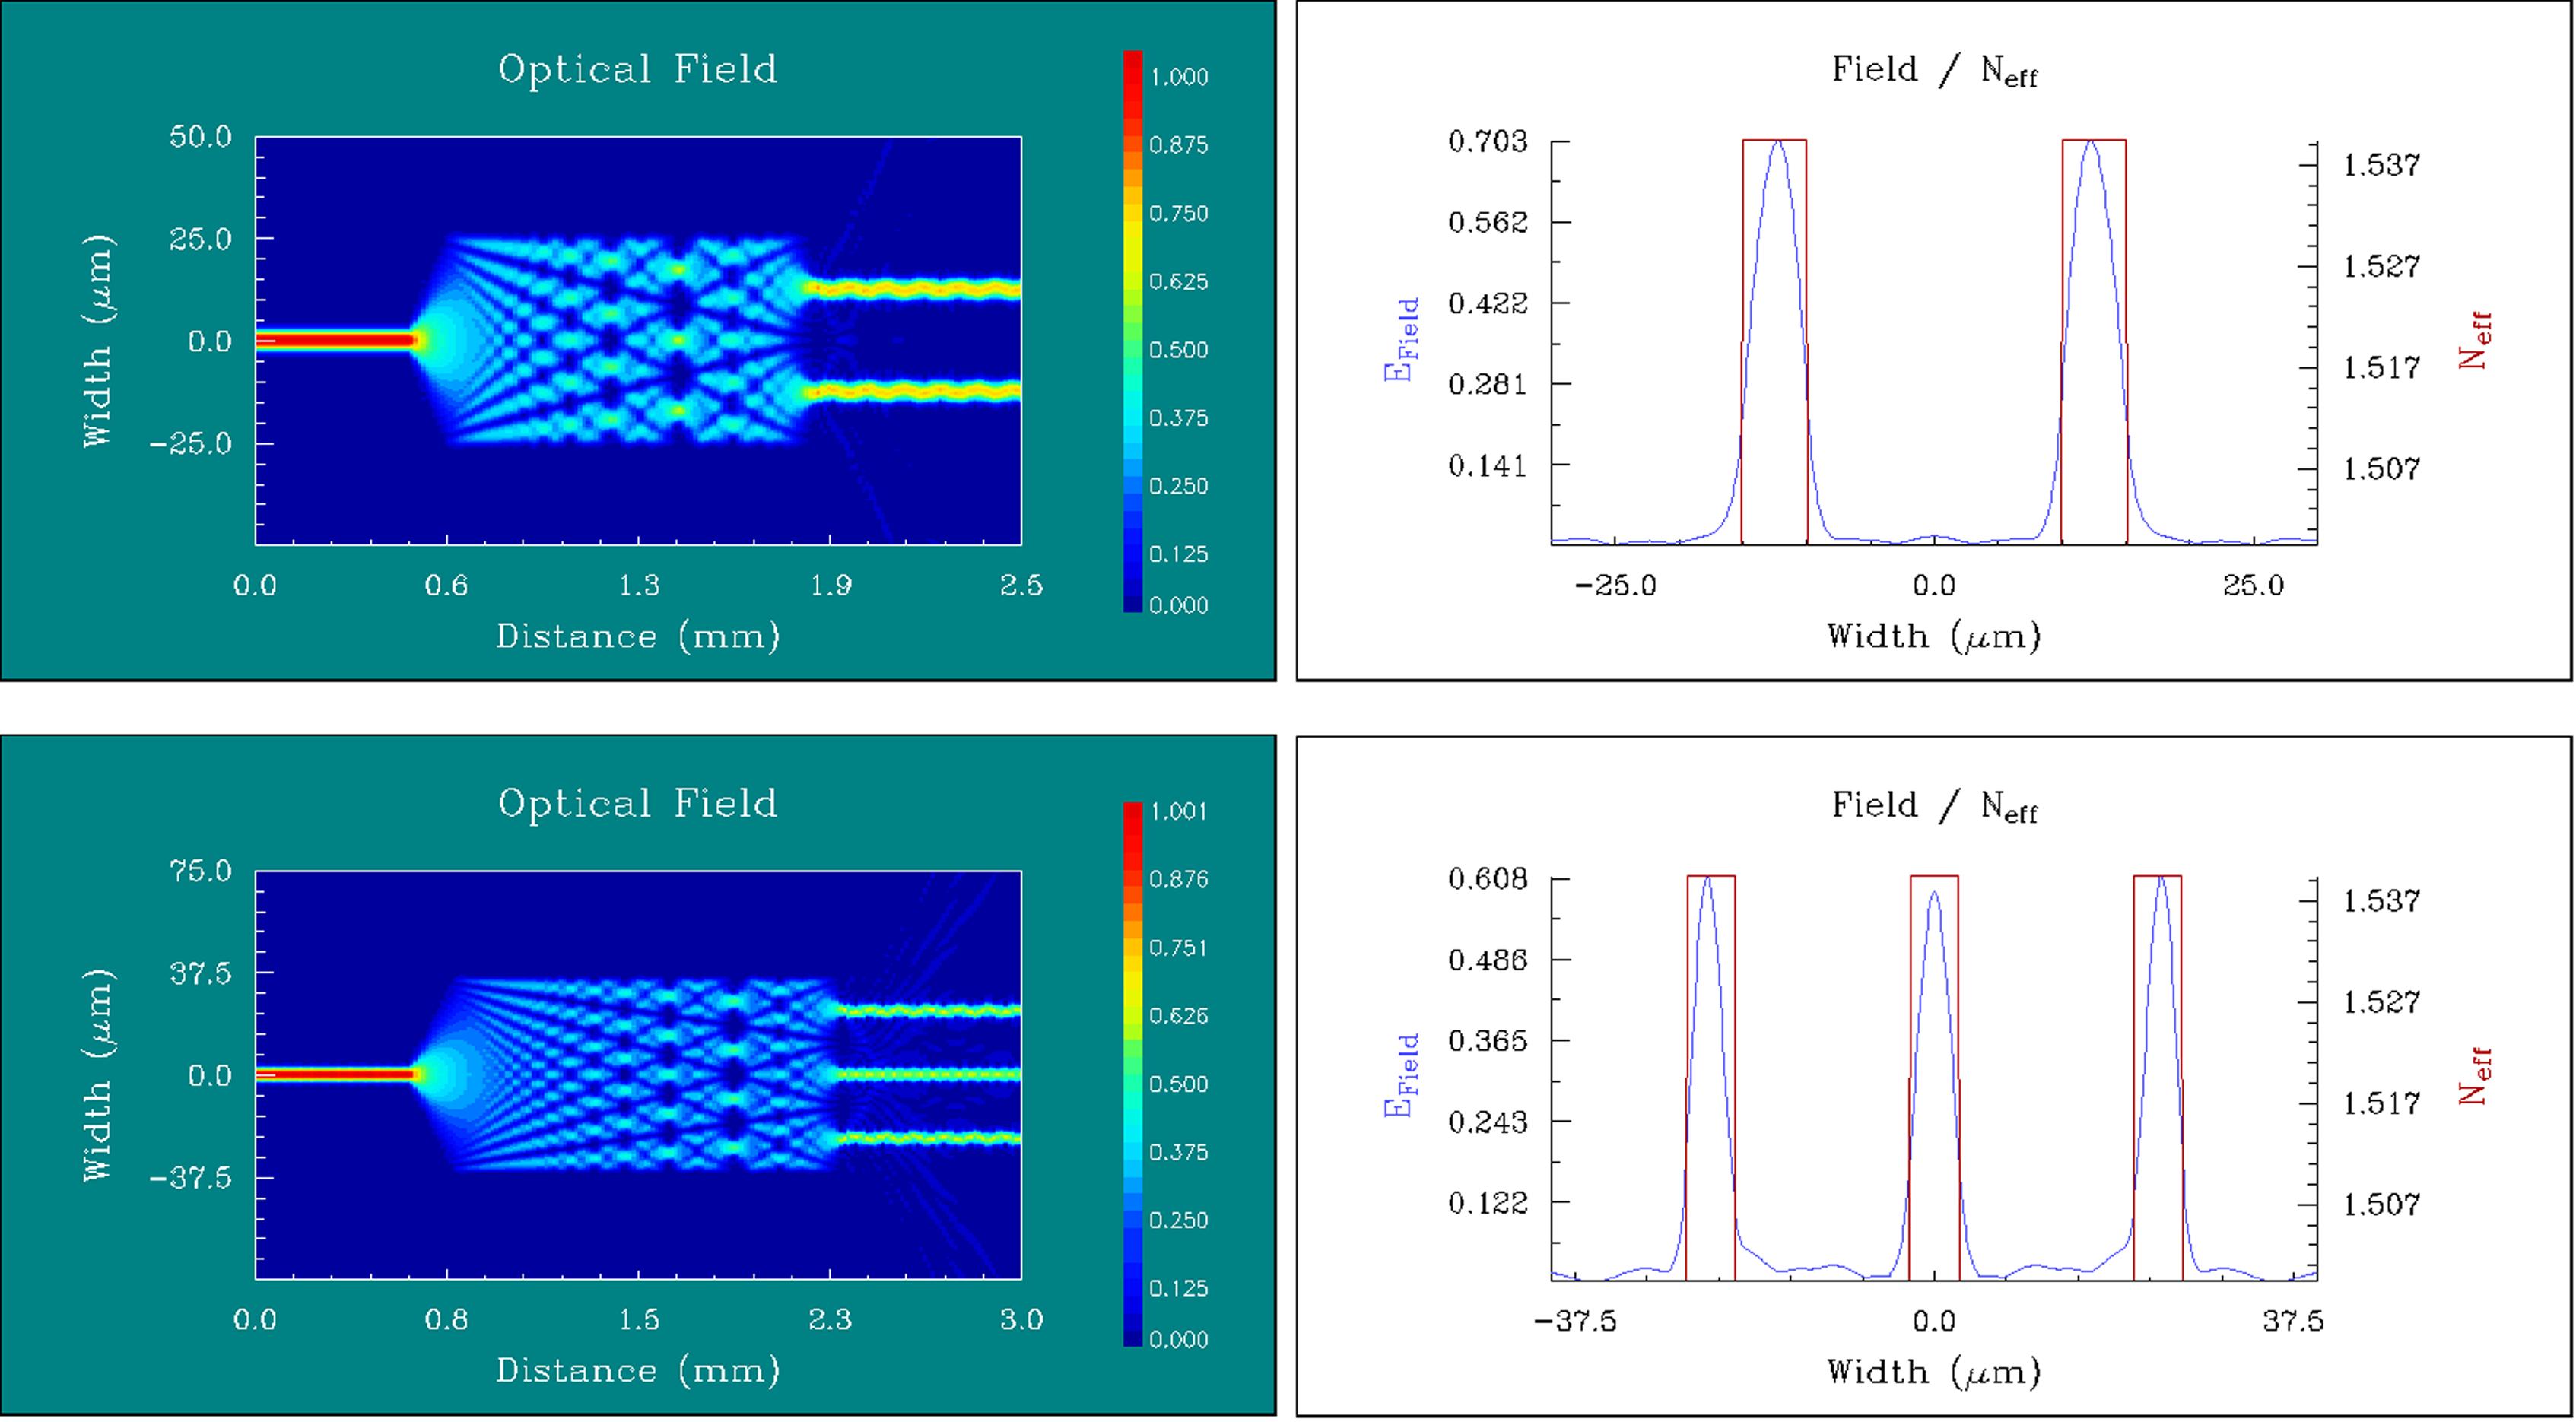 19 Inch Rack Mount 1u Fiber Optic Splitter